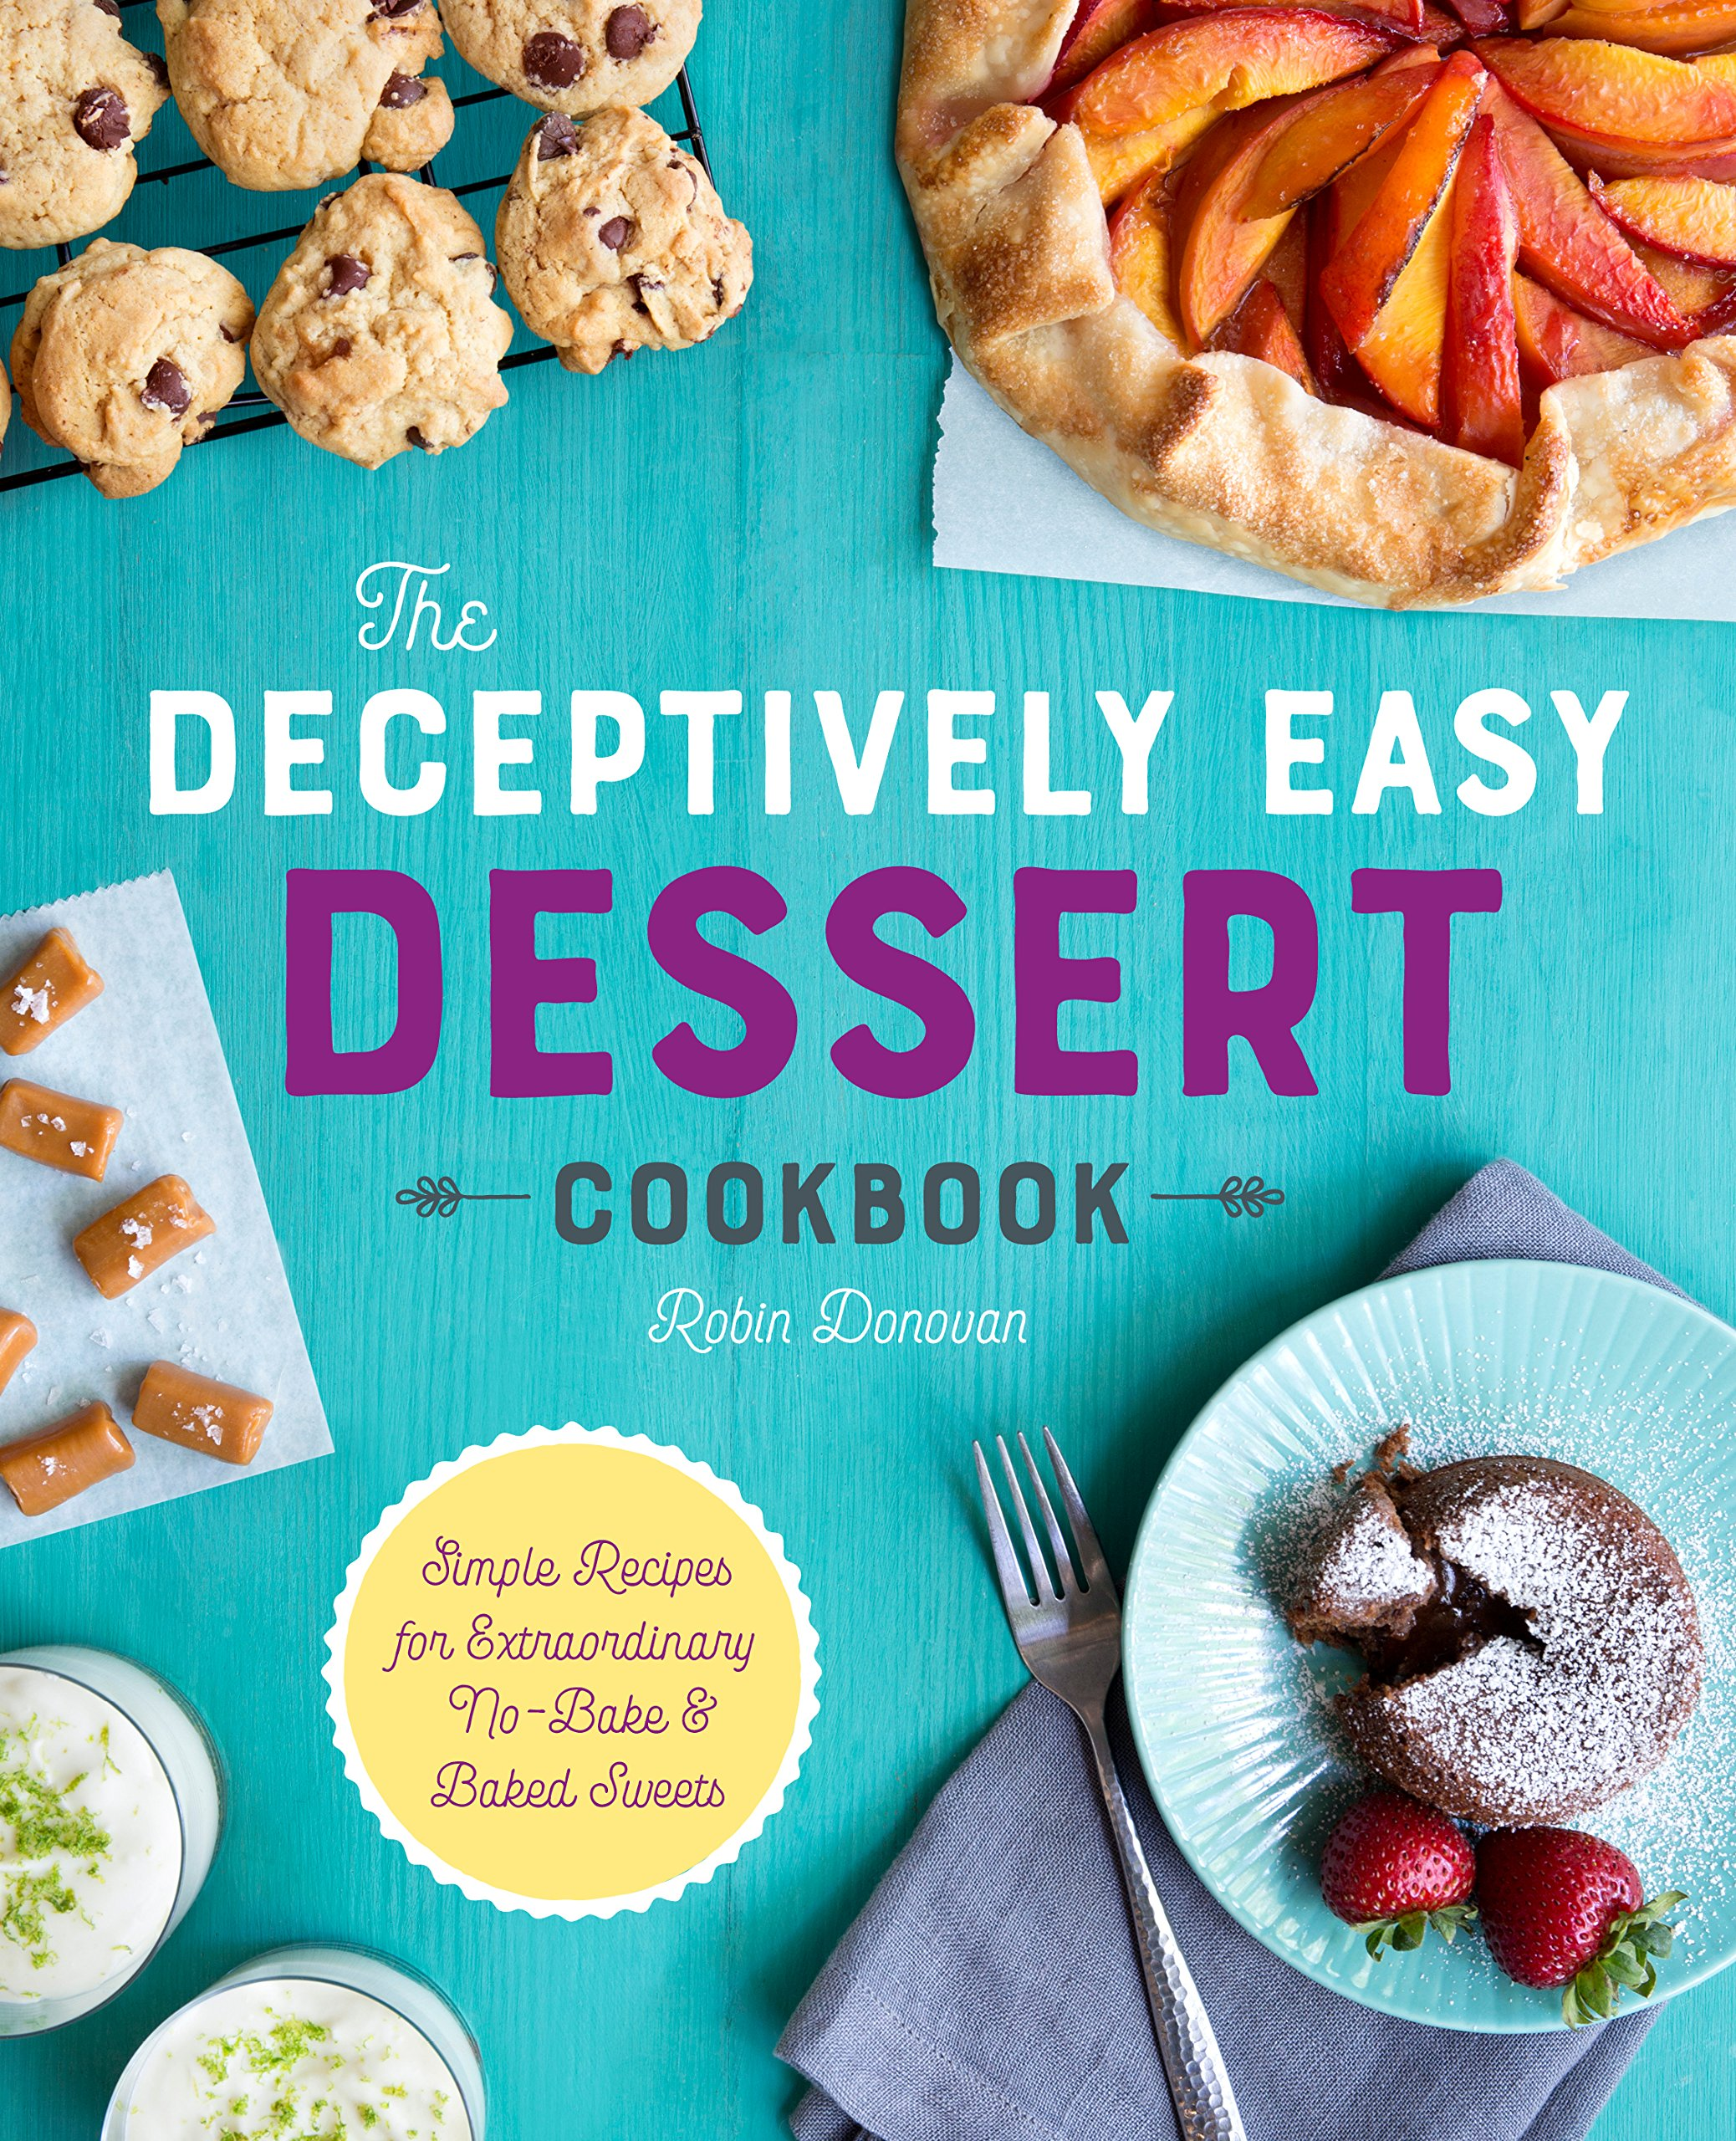 easy dessert recipe book The Deceptively Easy Dessert Cookbook: Simple Recipes for